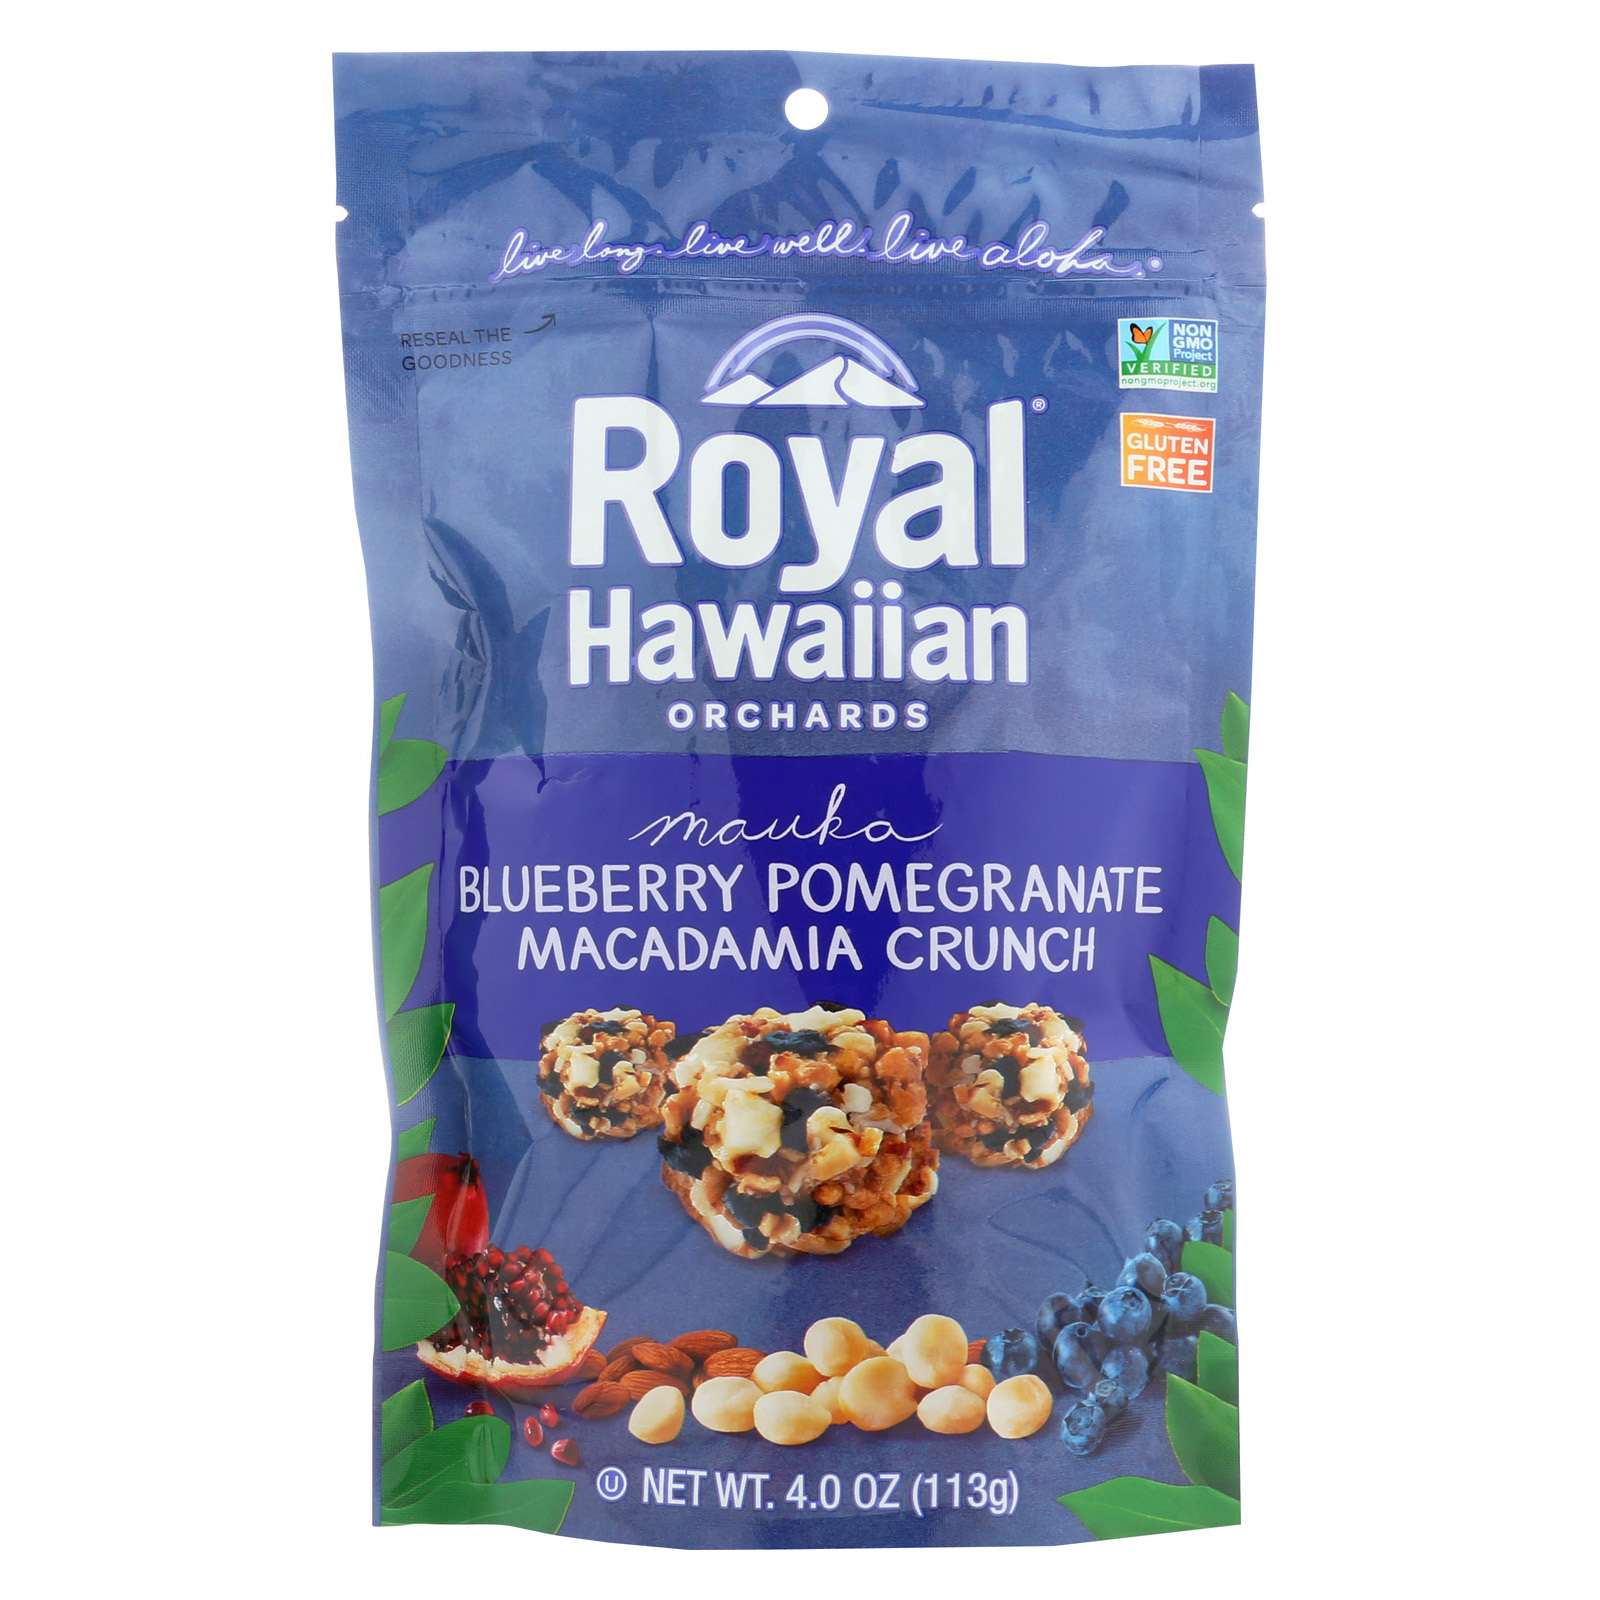 Royal Hawaiian Orchards Blueberry Pomegranate - Macadamia Crunch - Case of 6 - 4 oz.